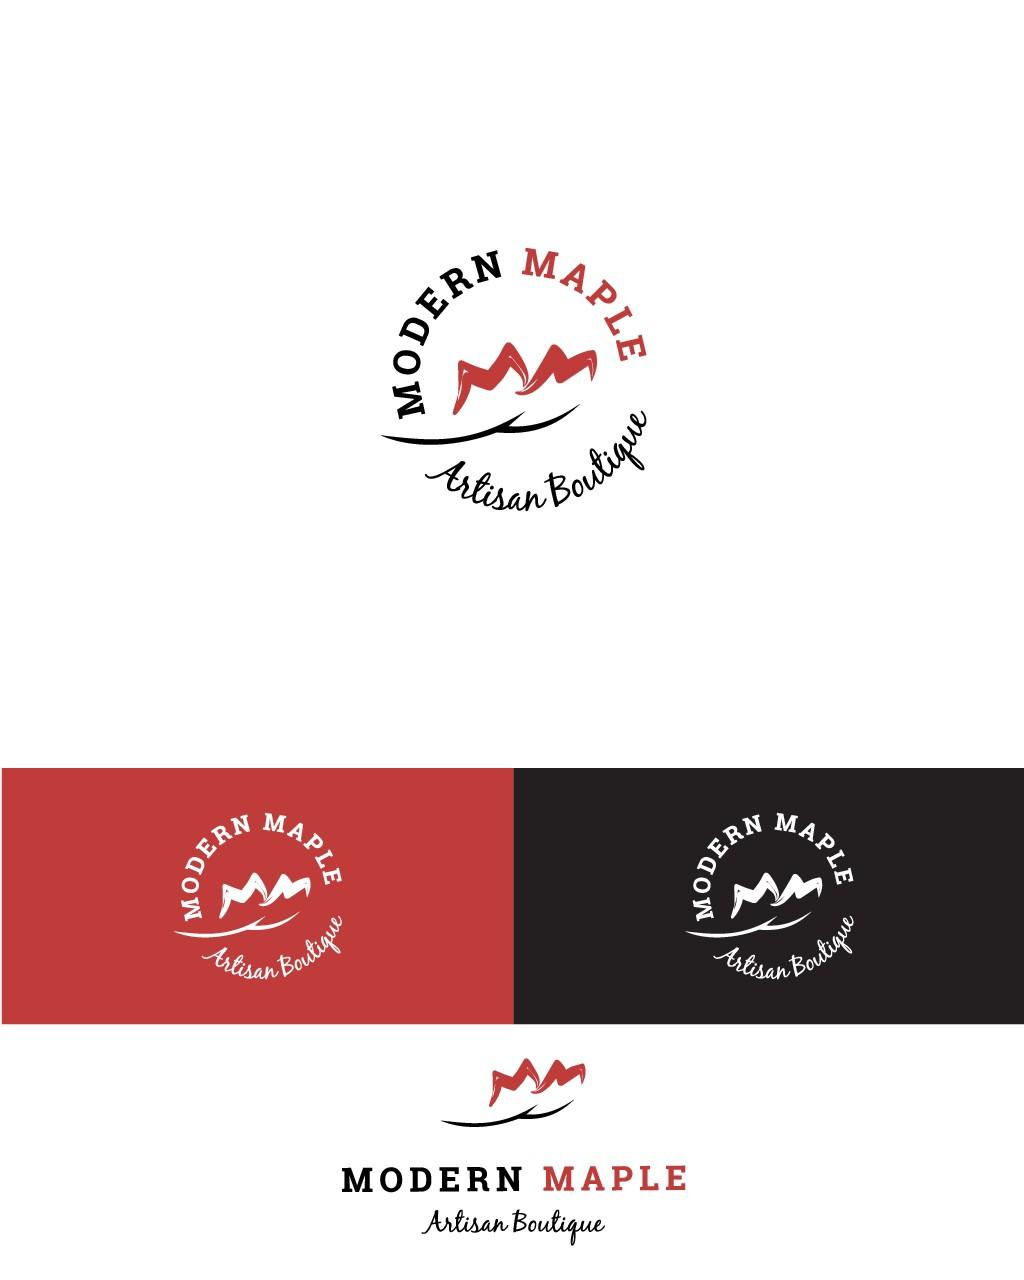 Canadian Artisan Boutique needs a CREATIVE, bold, minimalist logo